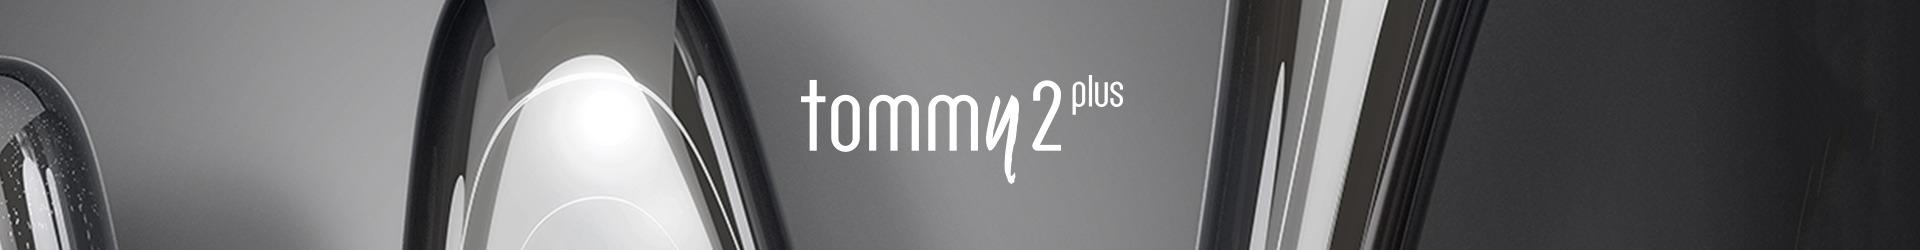 Tommy2 plus